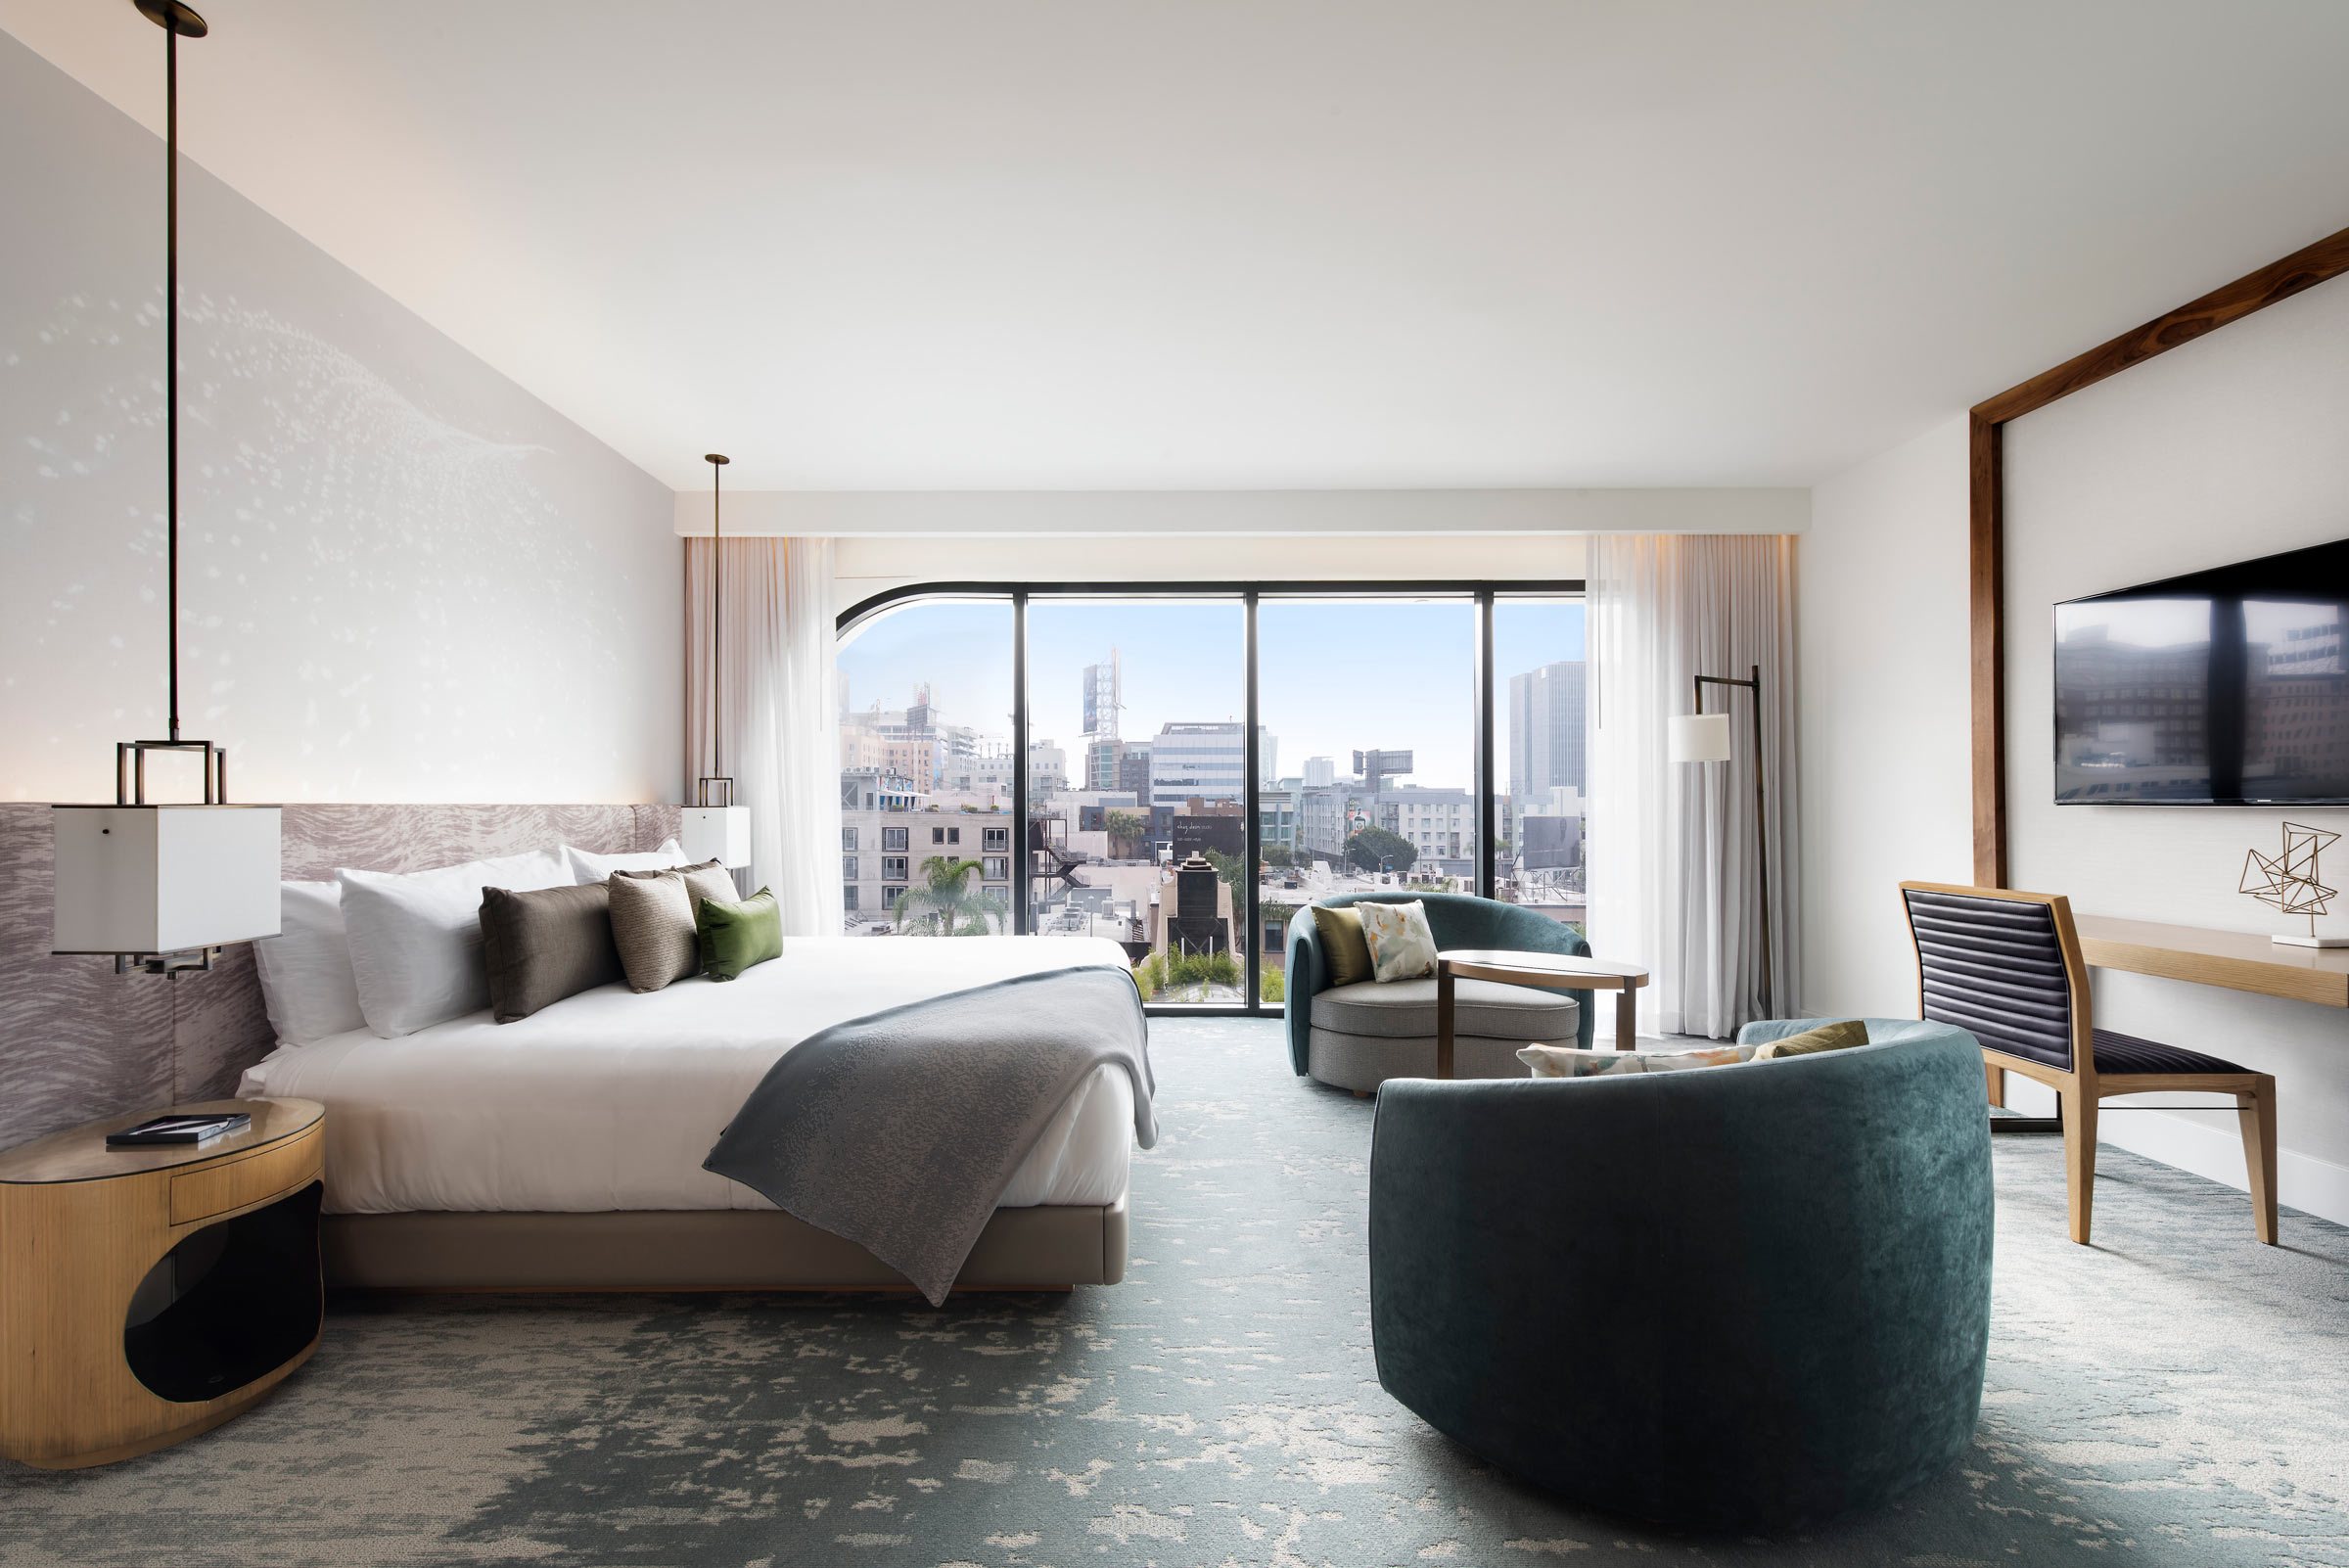 Dream_Hotel_513_GoldKing_0052.jpg